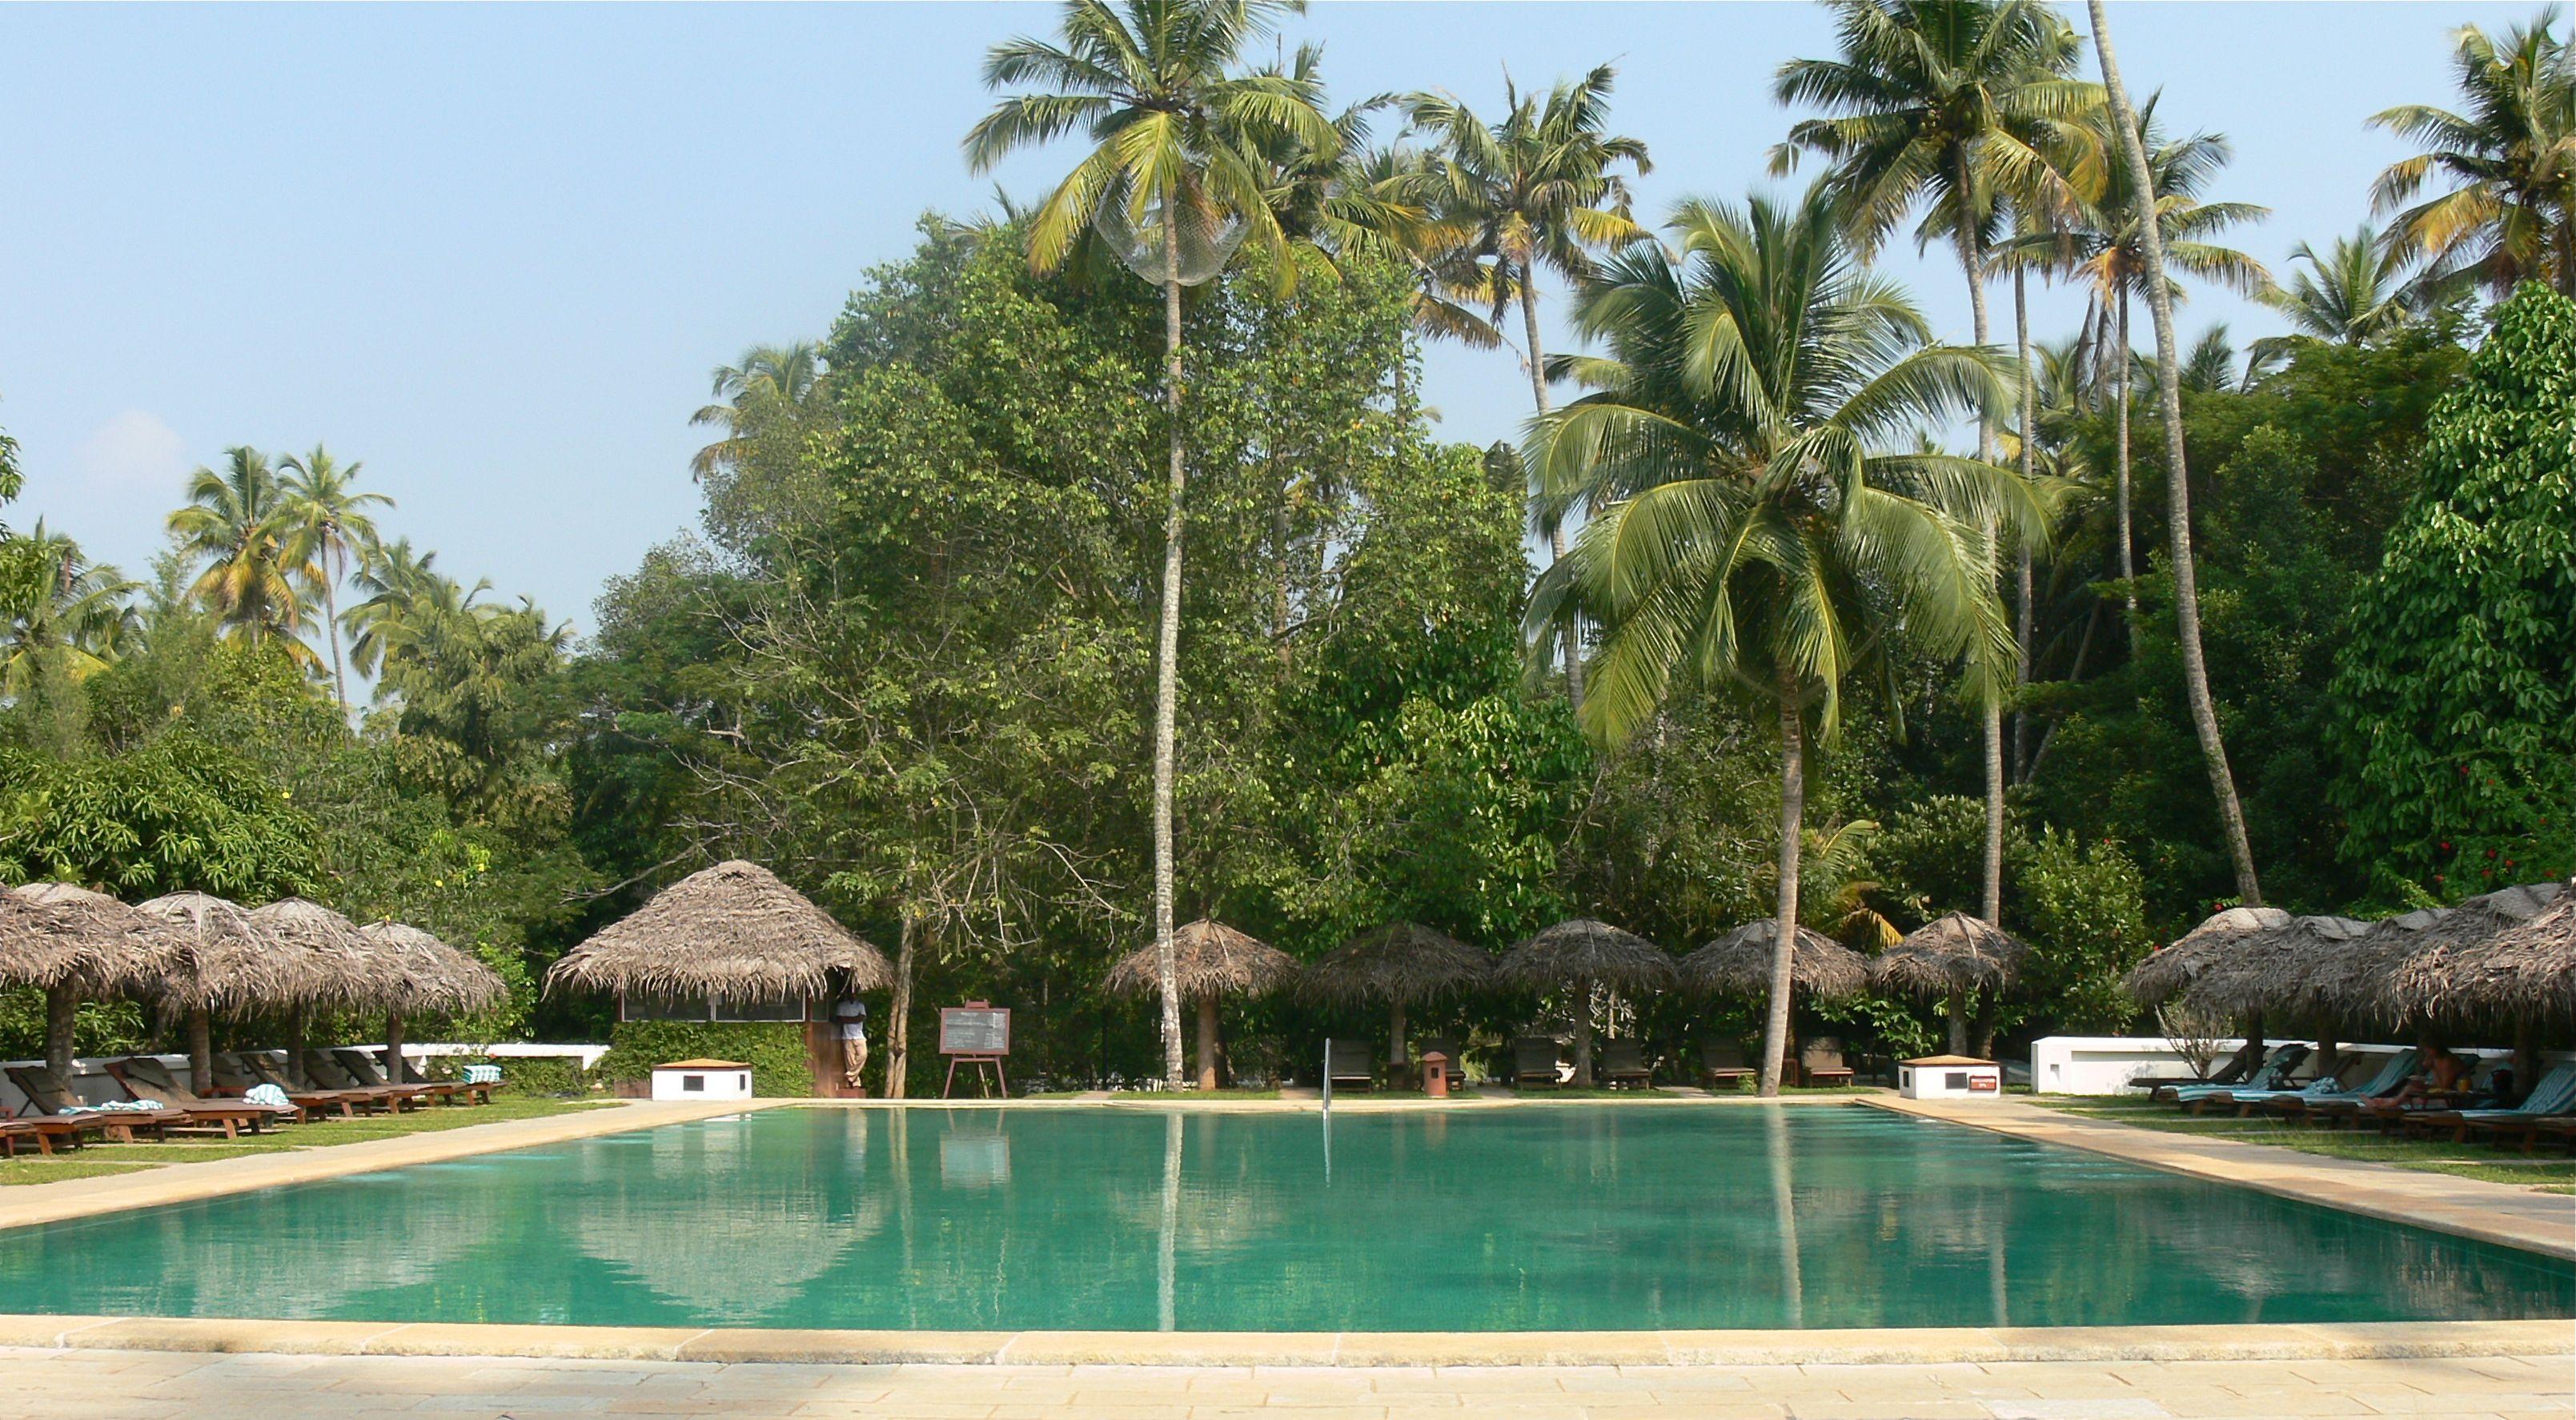 Marari beach resort gwiltypleasures for Small luxury hotel 7 little words